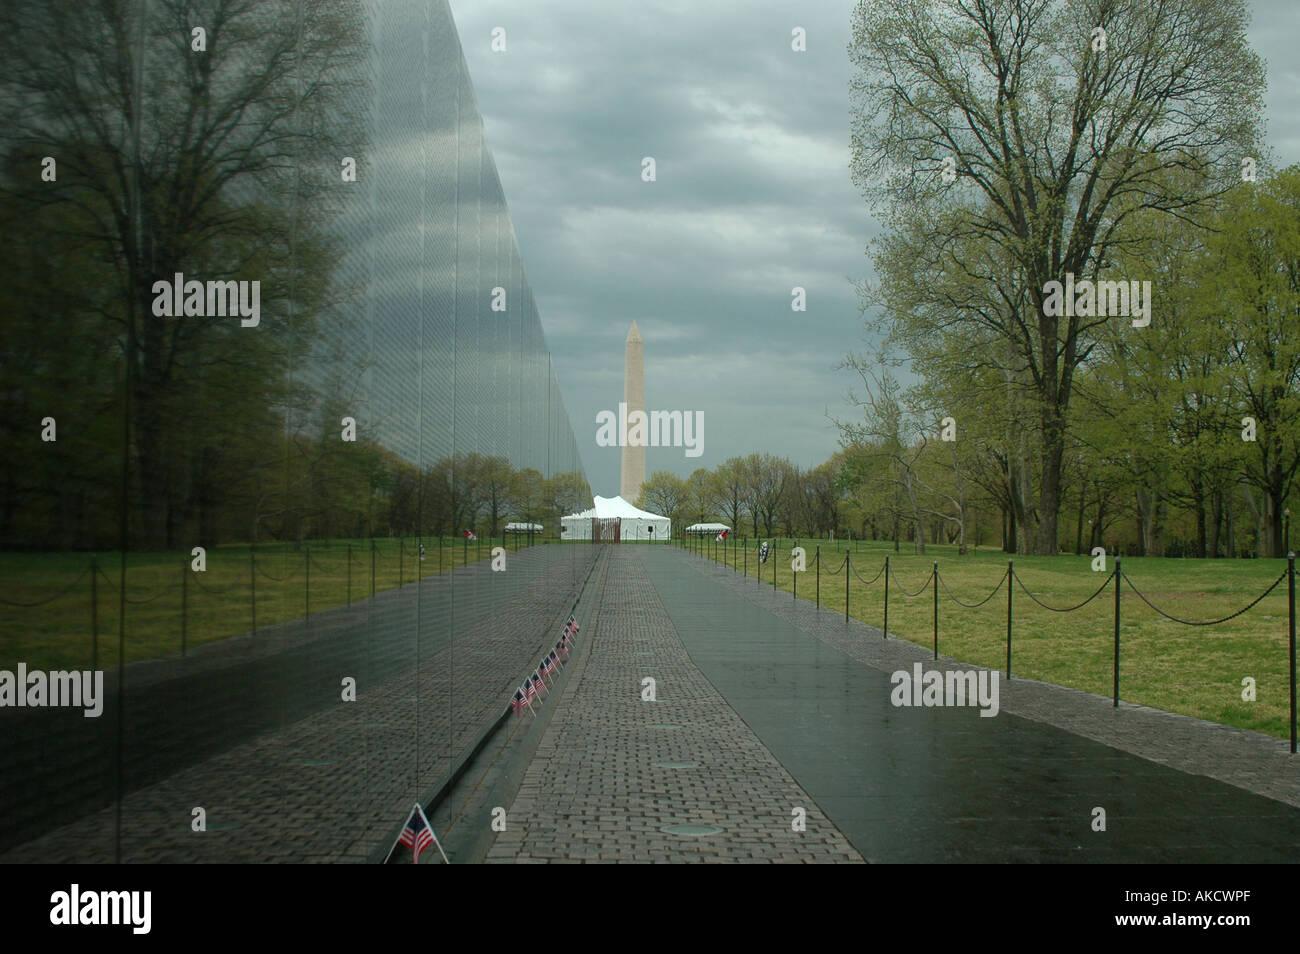 WASHINGTON DC VIETNAM VETERANS MEMORIAL DESIGNED BY MAYA LIN